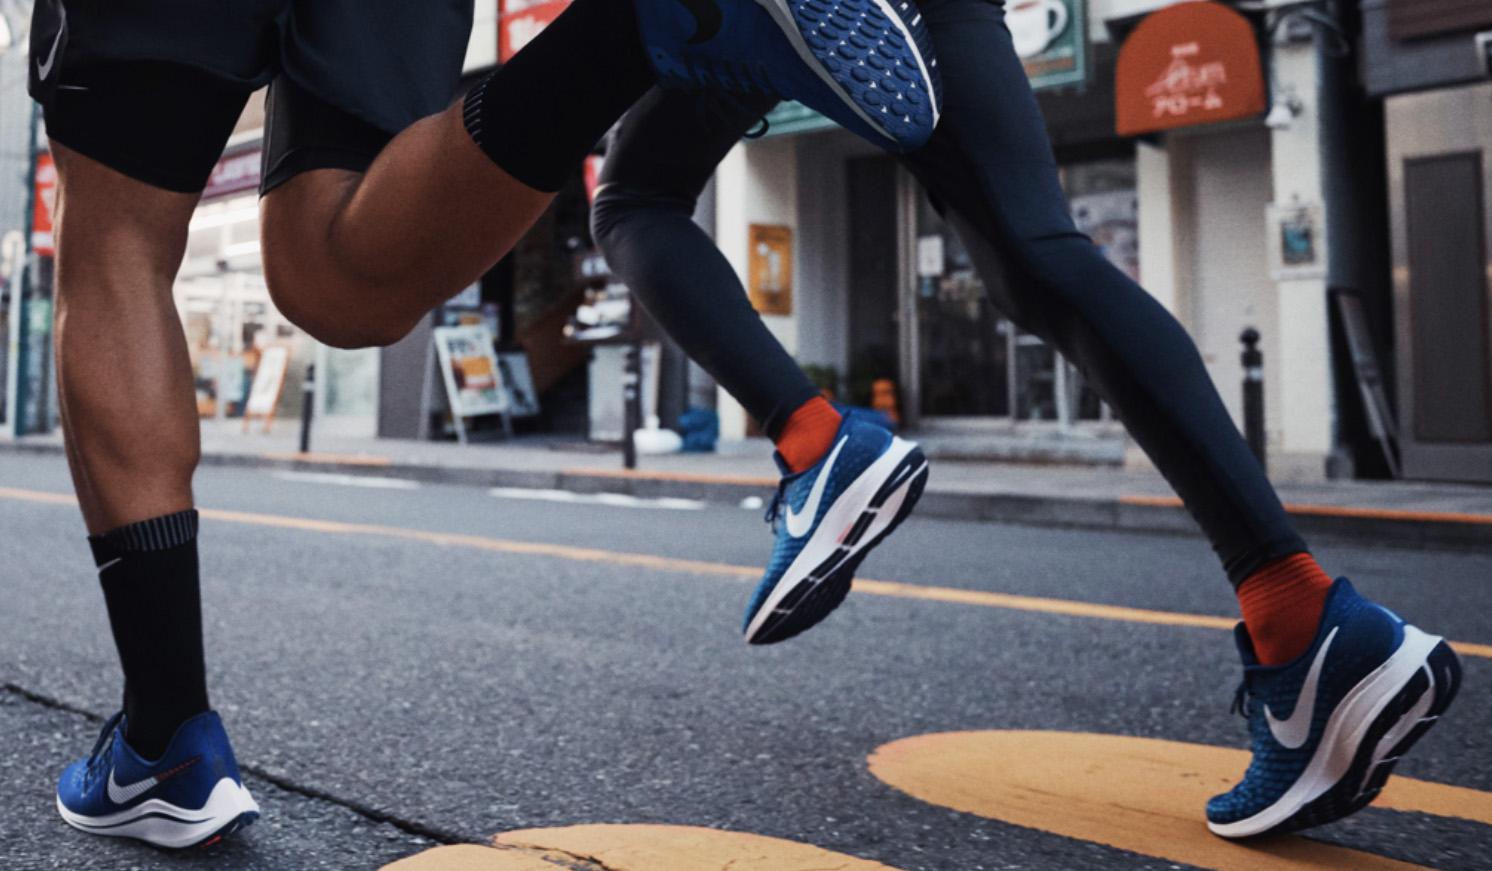 Best men's running shoes for summer starting at $55: Nike, Brooks, more